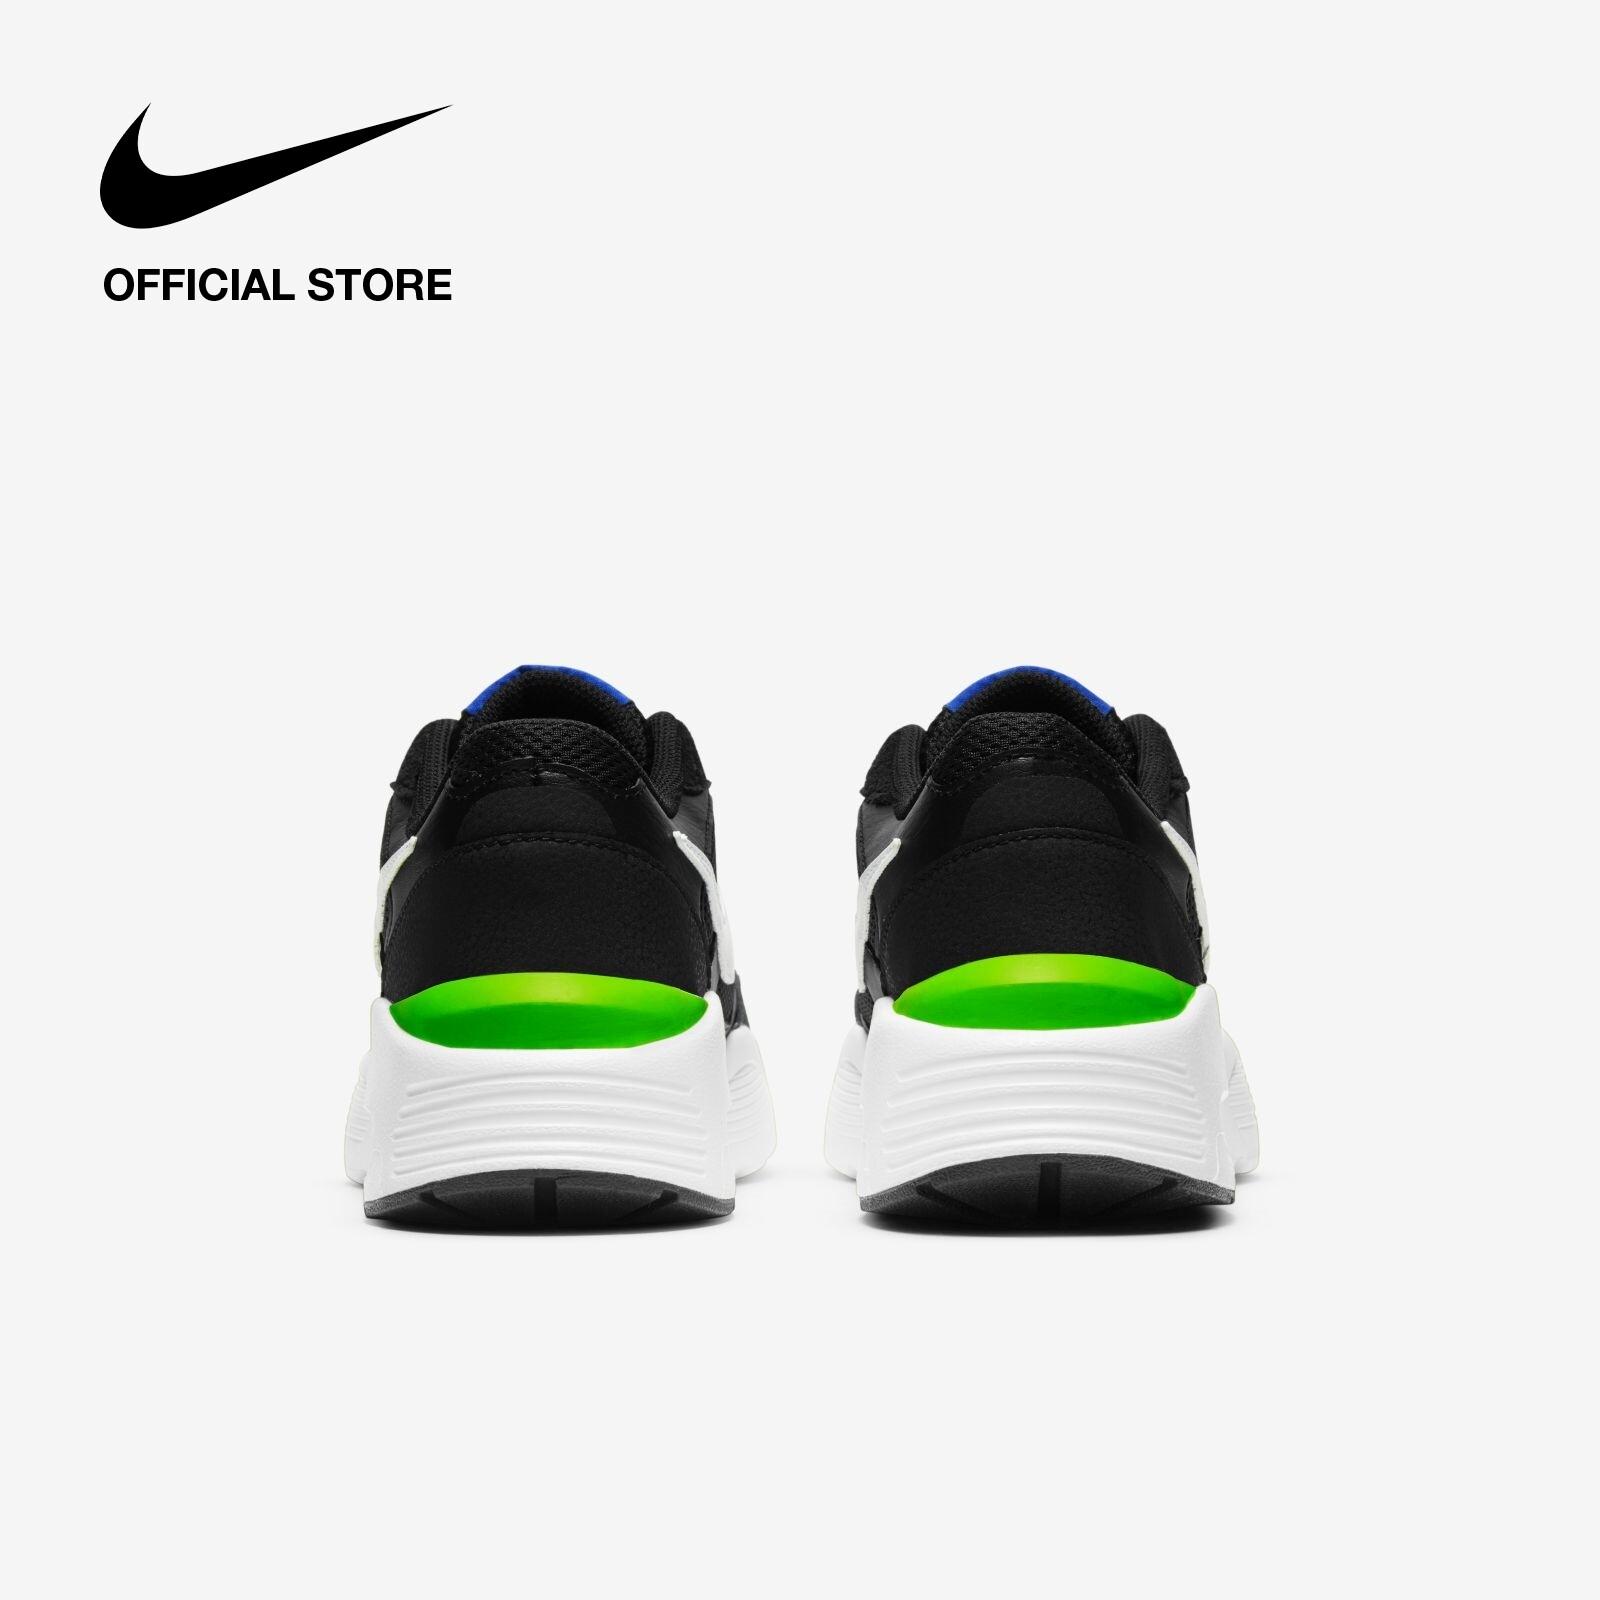 Nike Men's Air Max Fusion Shoes - Black ไนกี้ รองเท้าผู้ชาย แอร์ แม็กซ์ ฟิวชั่น - สีดำ